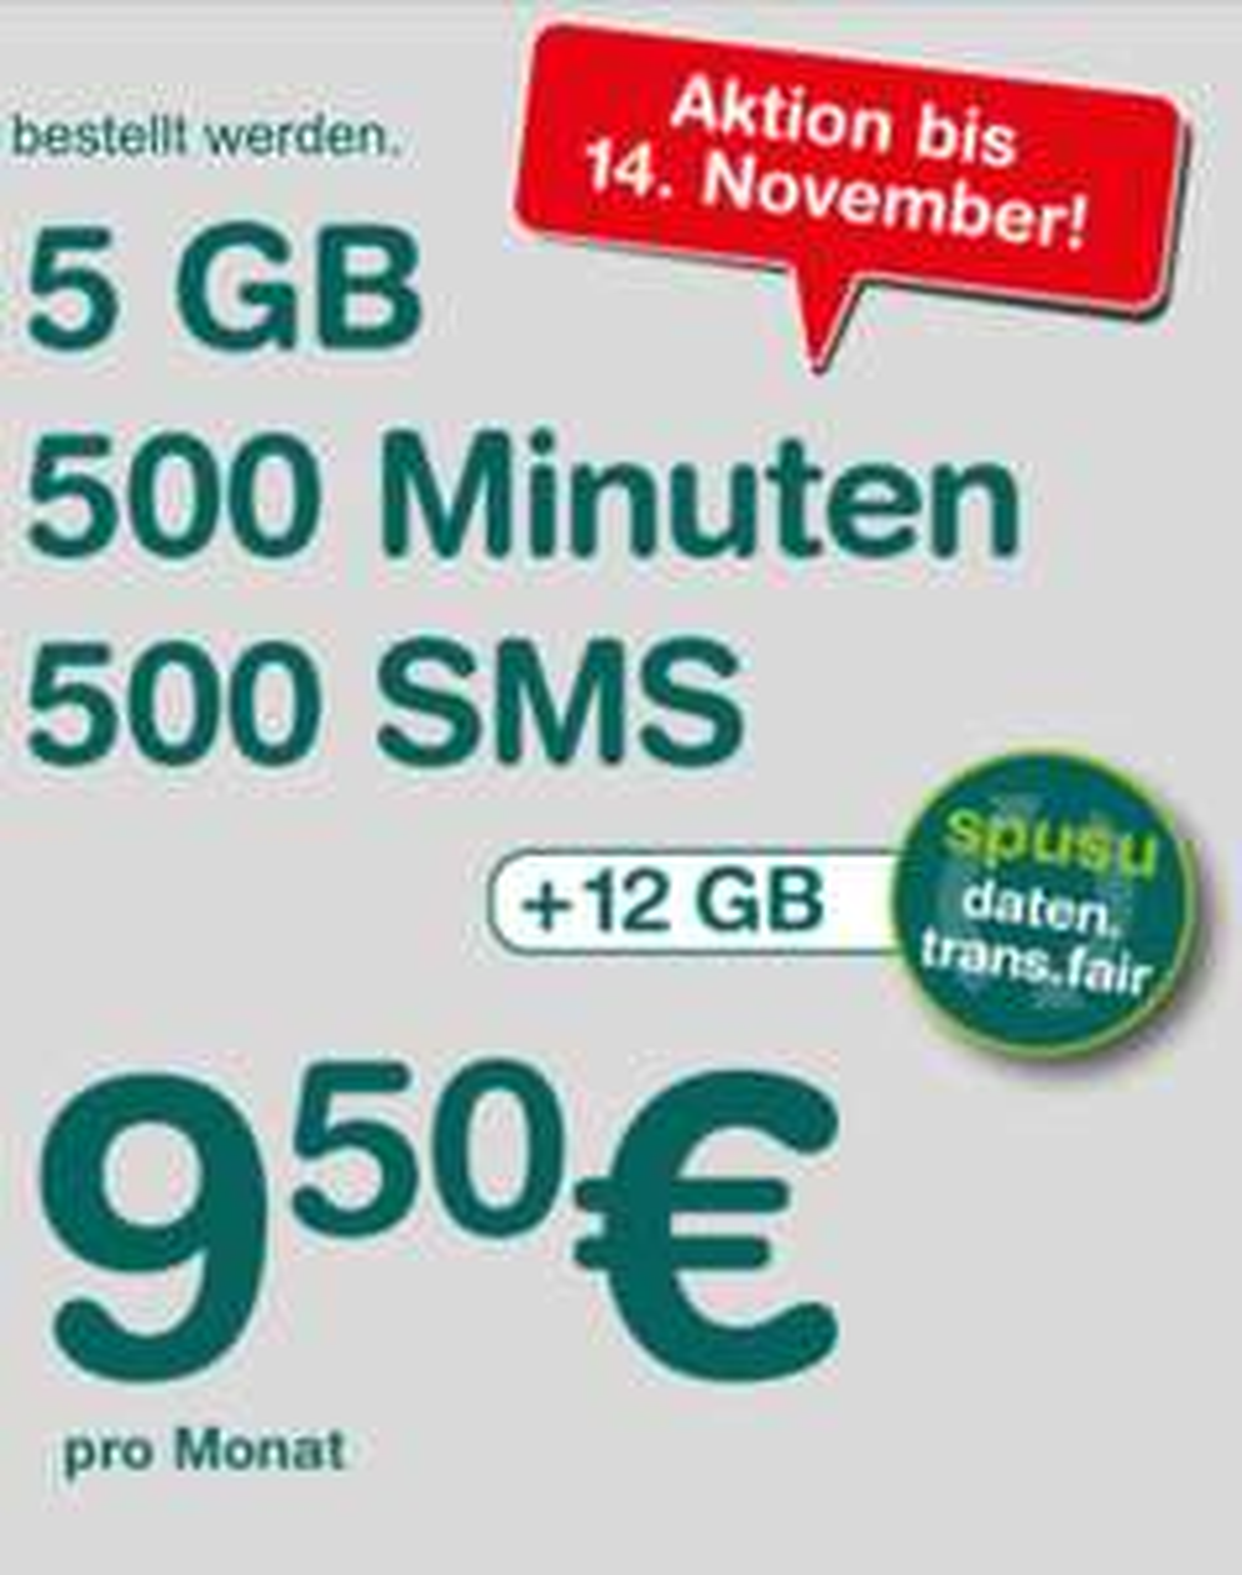 Spusu 6000 um 9,50 € (500 Min, 500 SMS, 5 GB LTE)